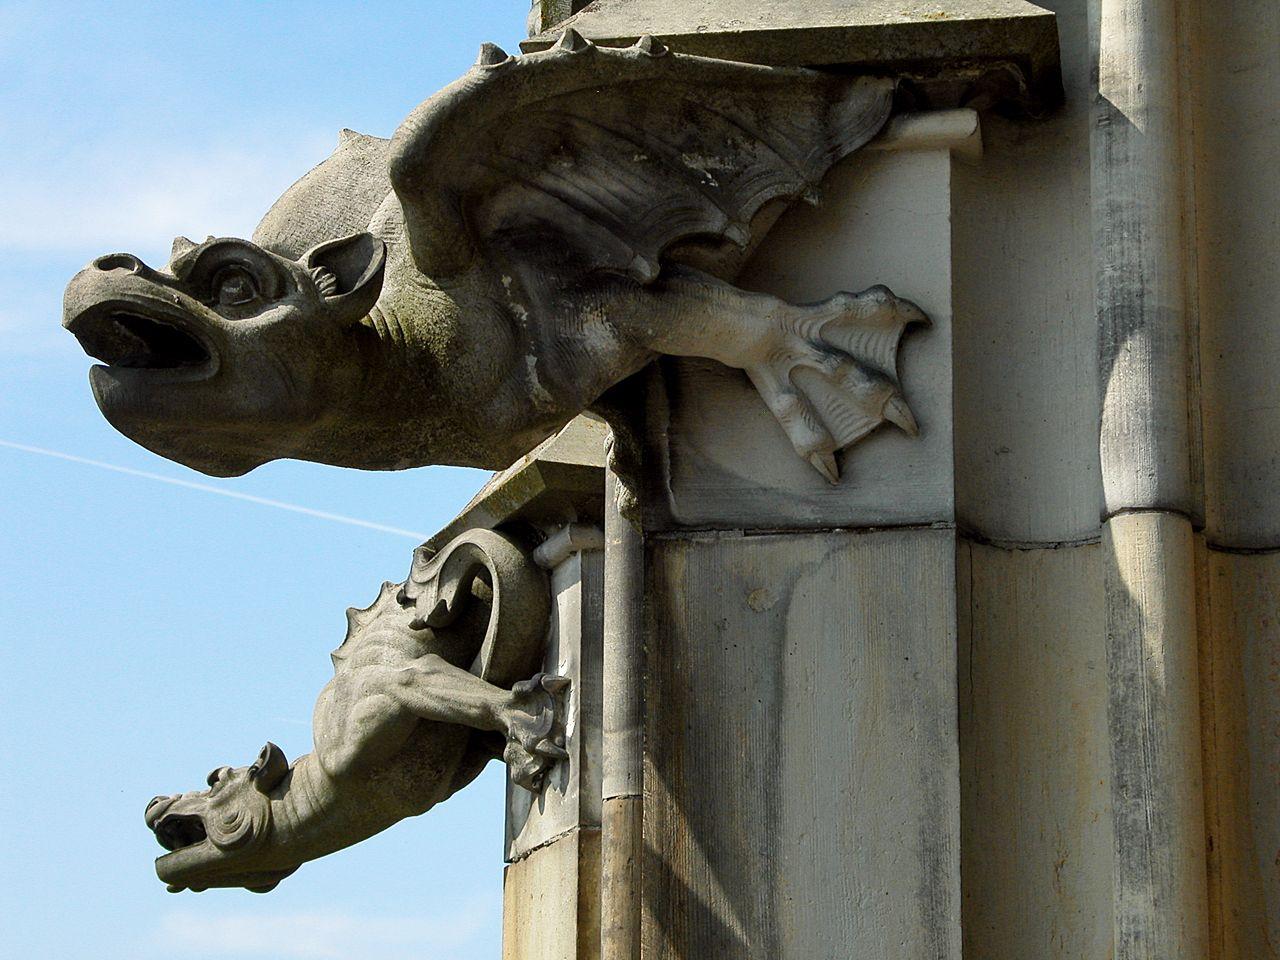 Gargoyles Found At The Ulm Munster Germany Tallest Gothic Church In